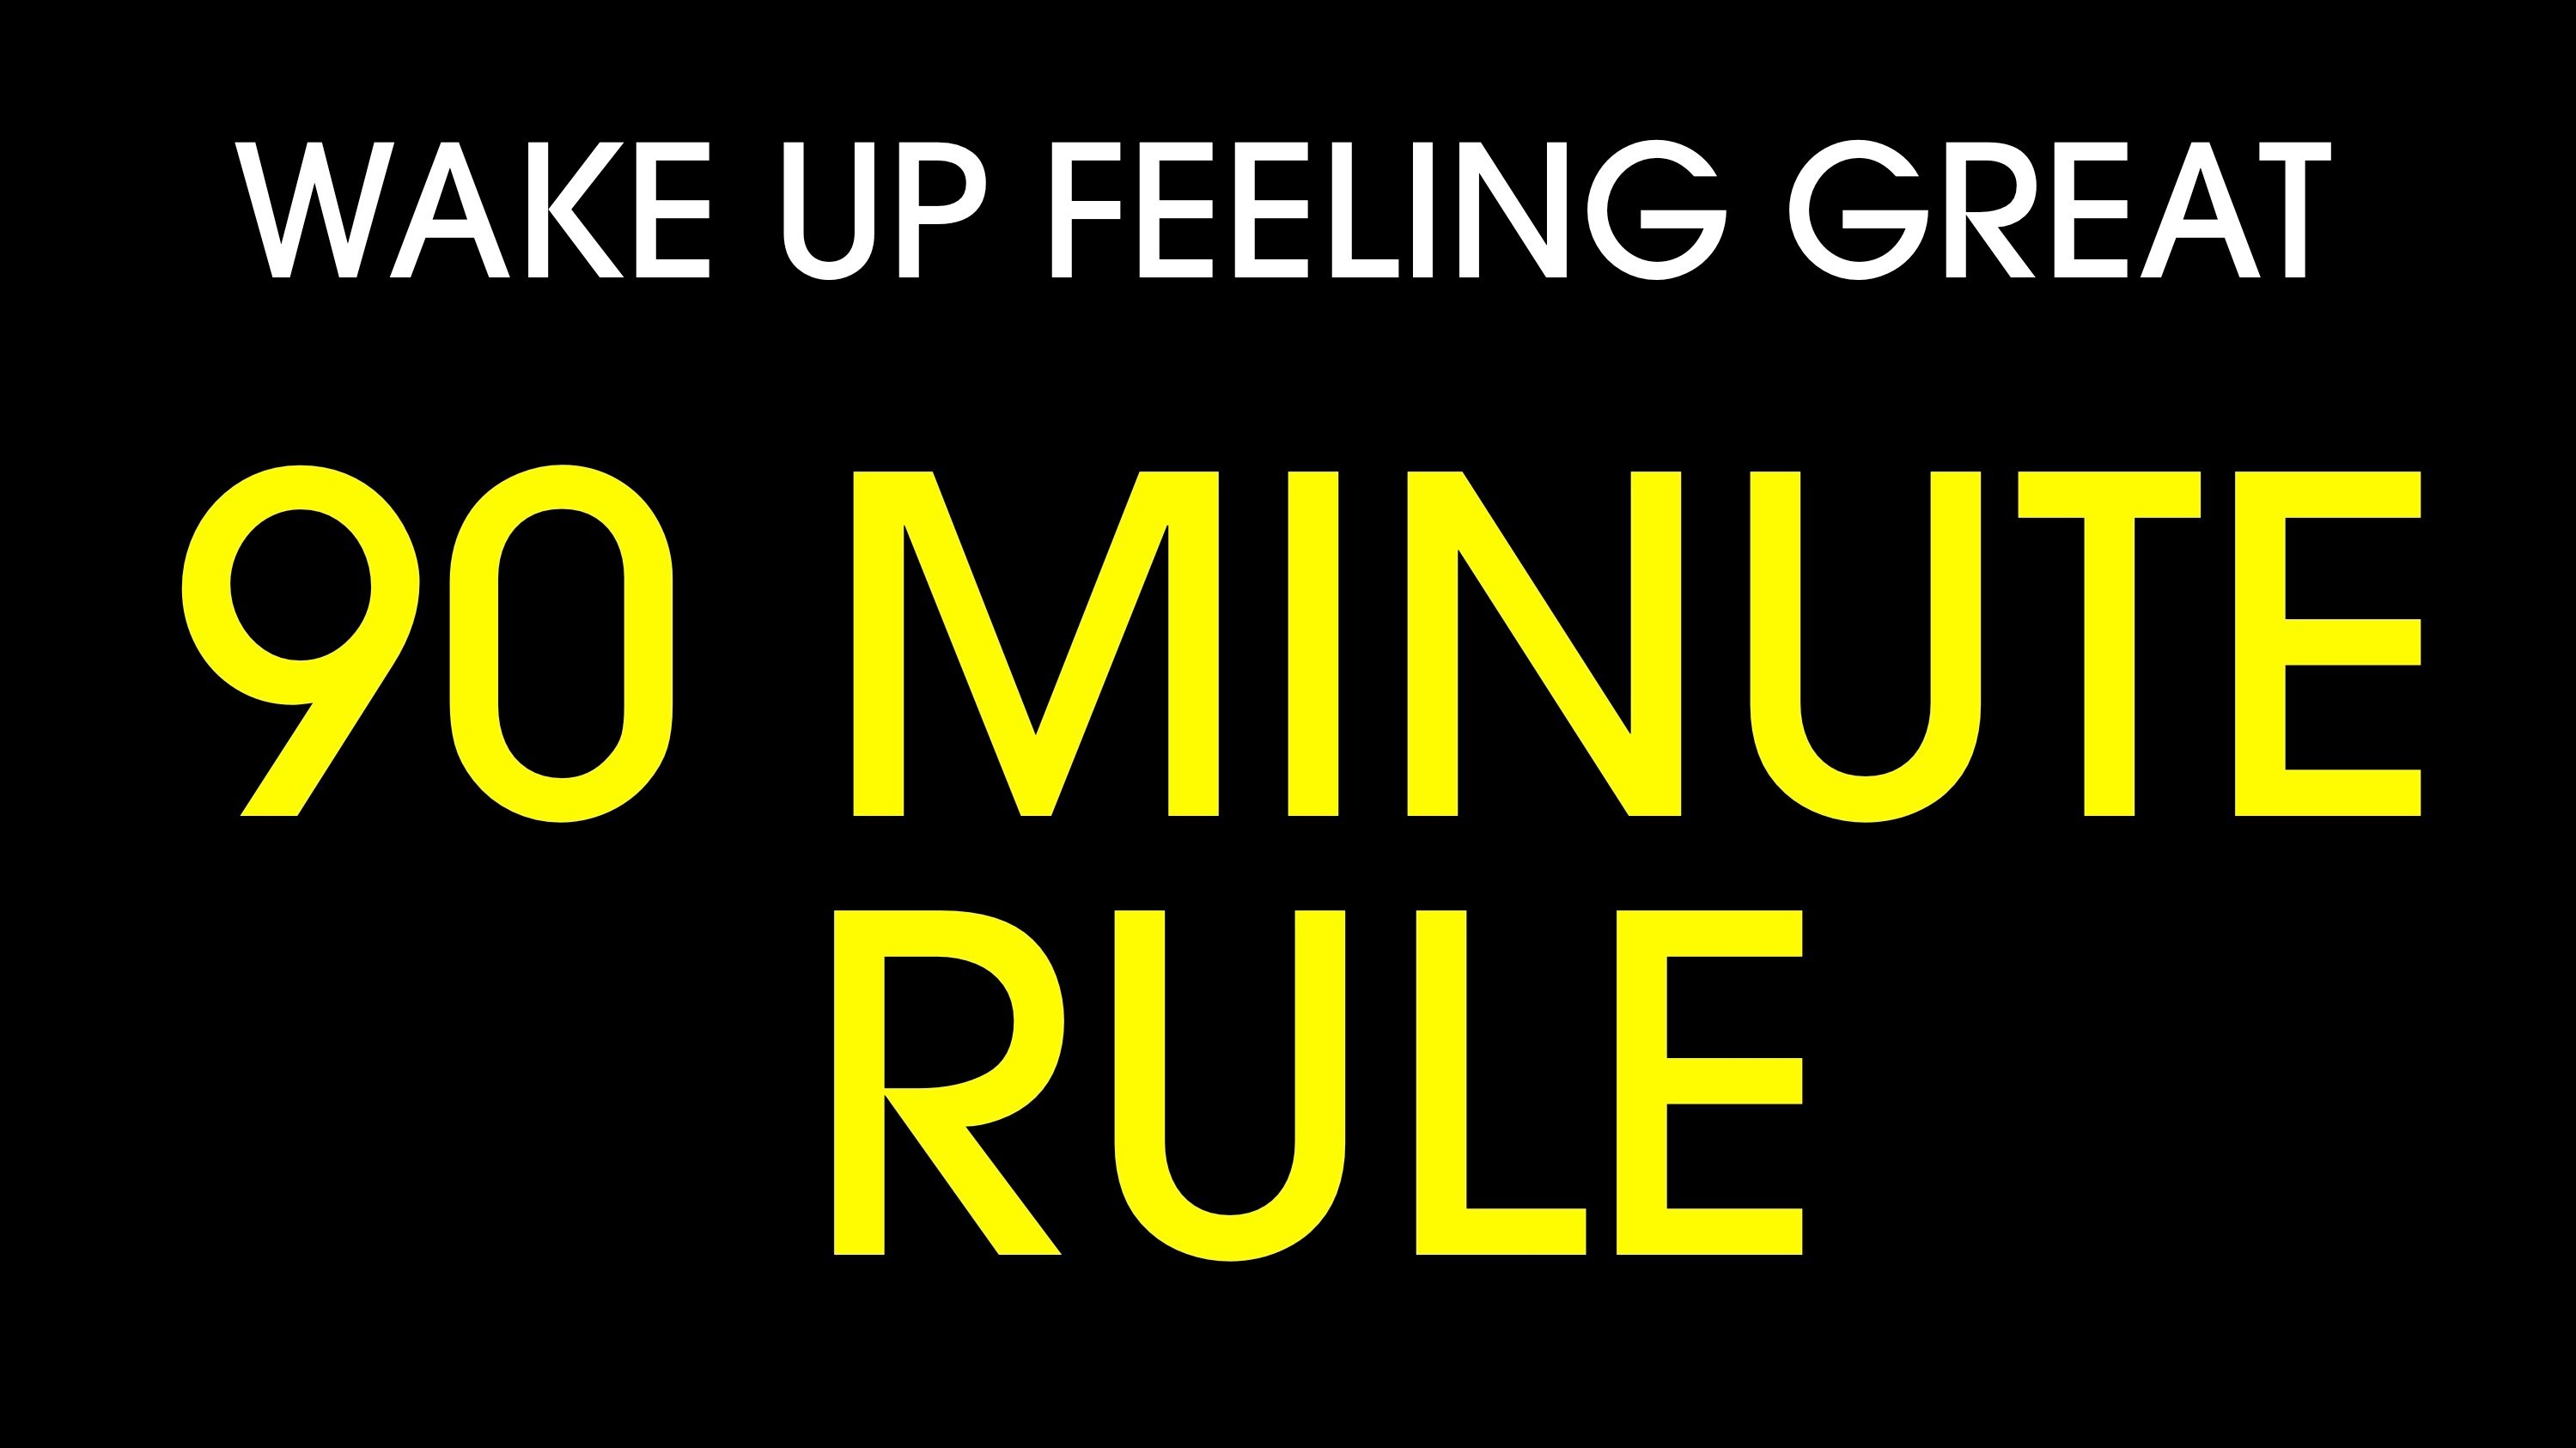 「科學讓你睡飽飽:奇妙的『九十分鐘法則』」- How to Wake up Feeling Great: The 90 Minute Rule